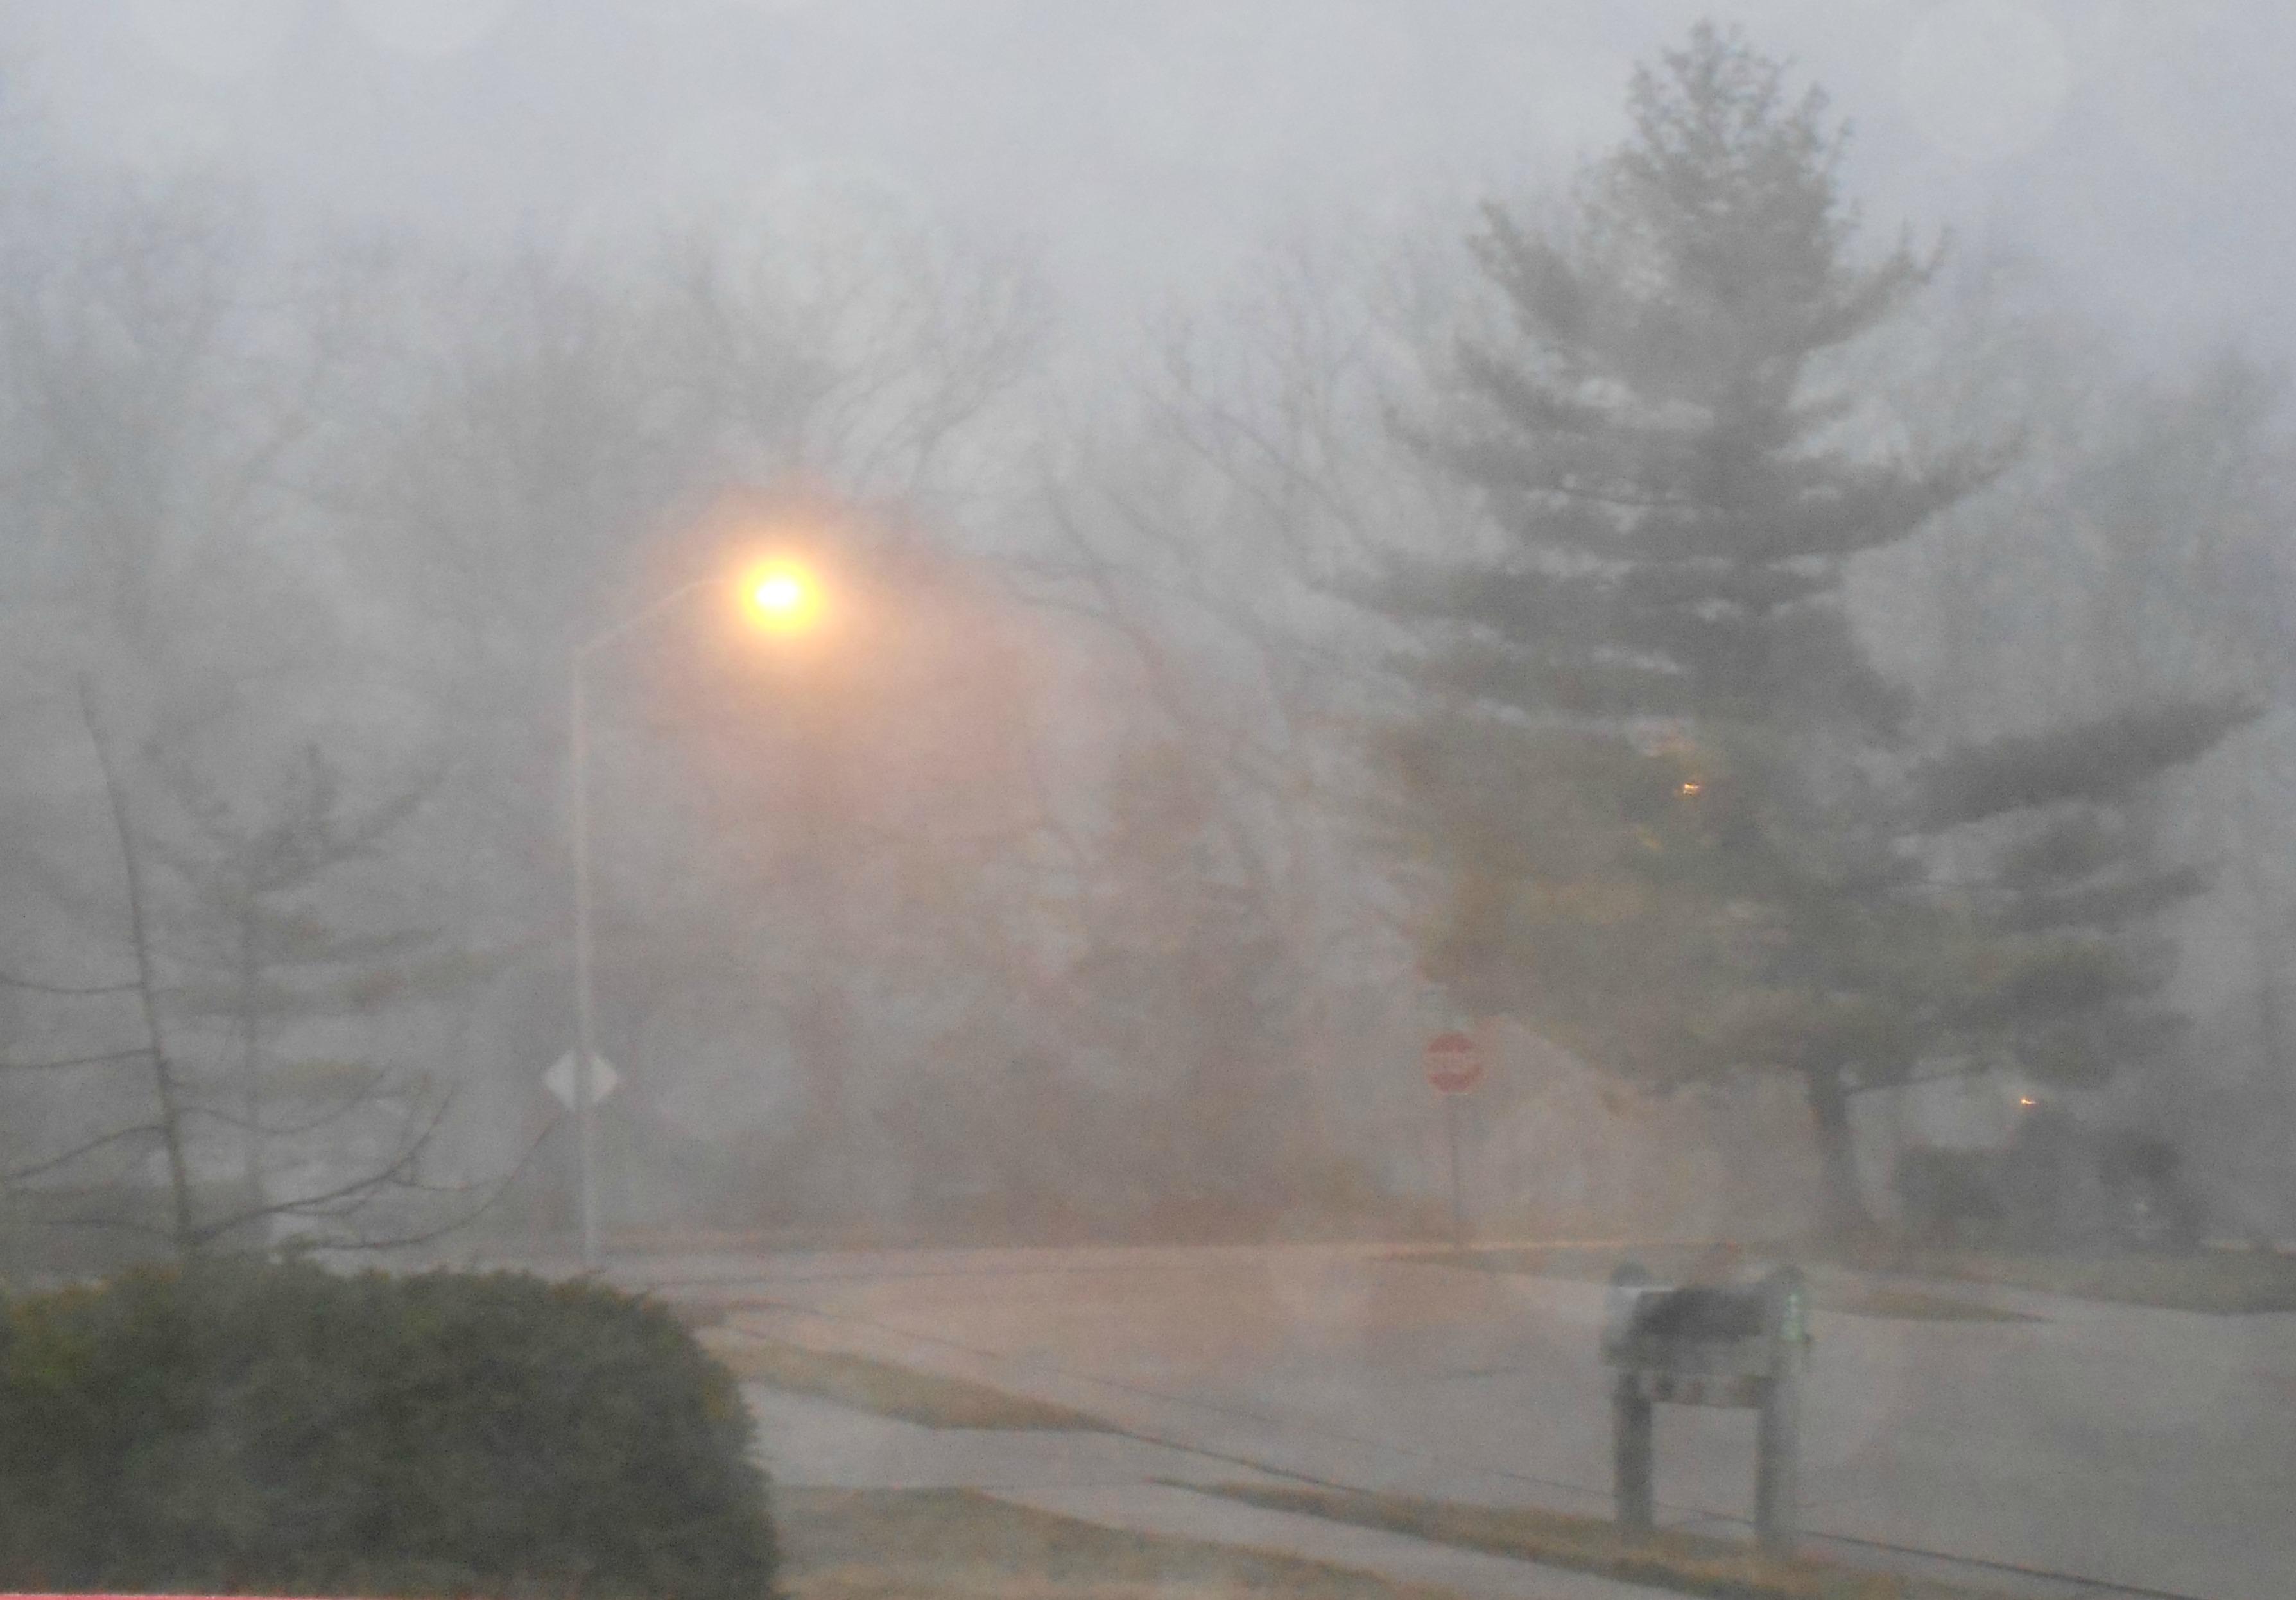 5 am and foggy